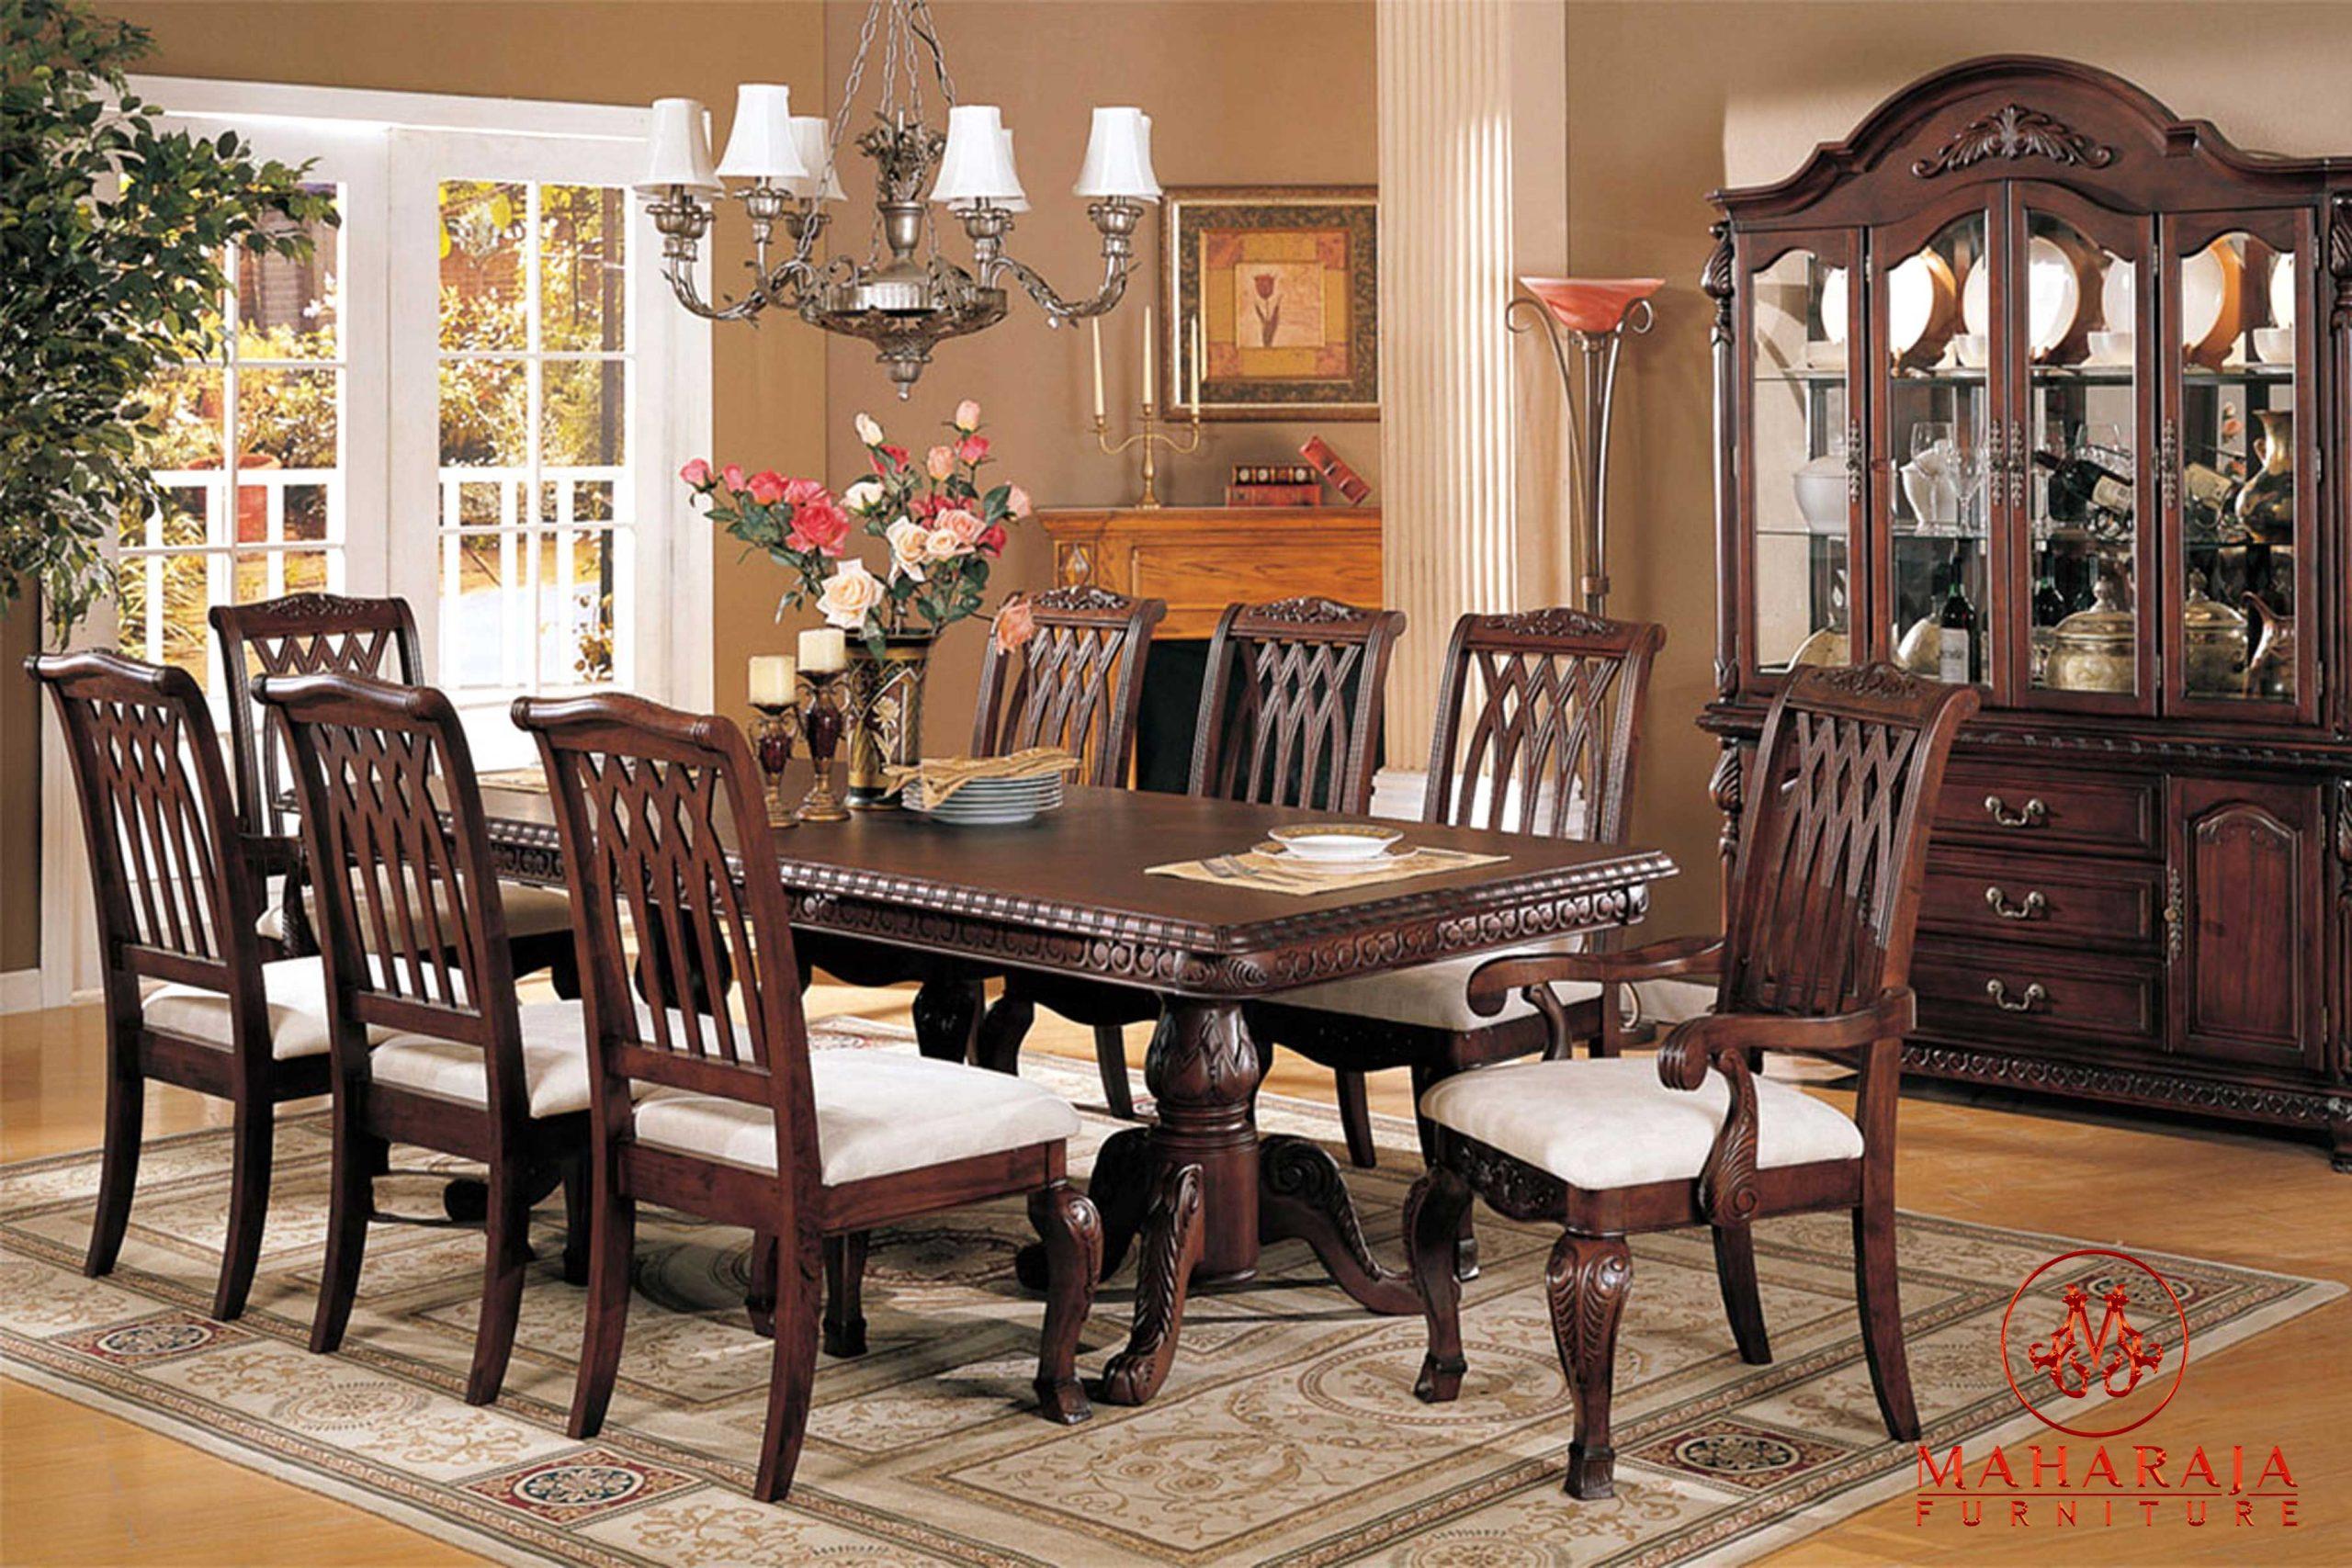 vintage-dining-teak-wood-square-dining-table